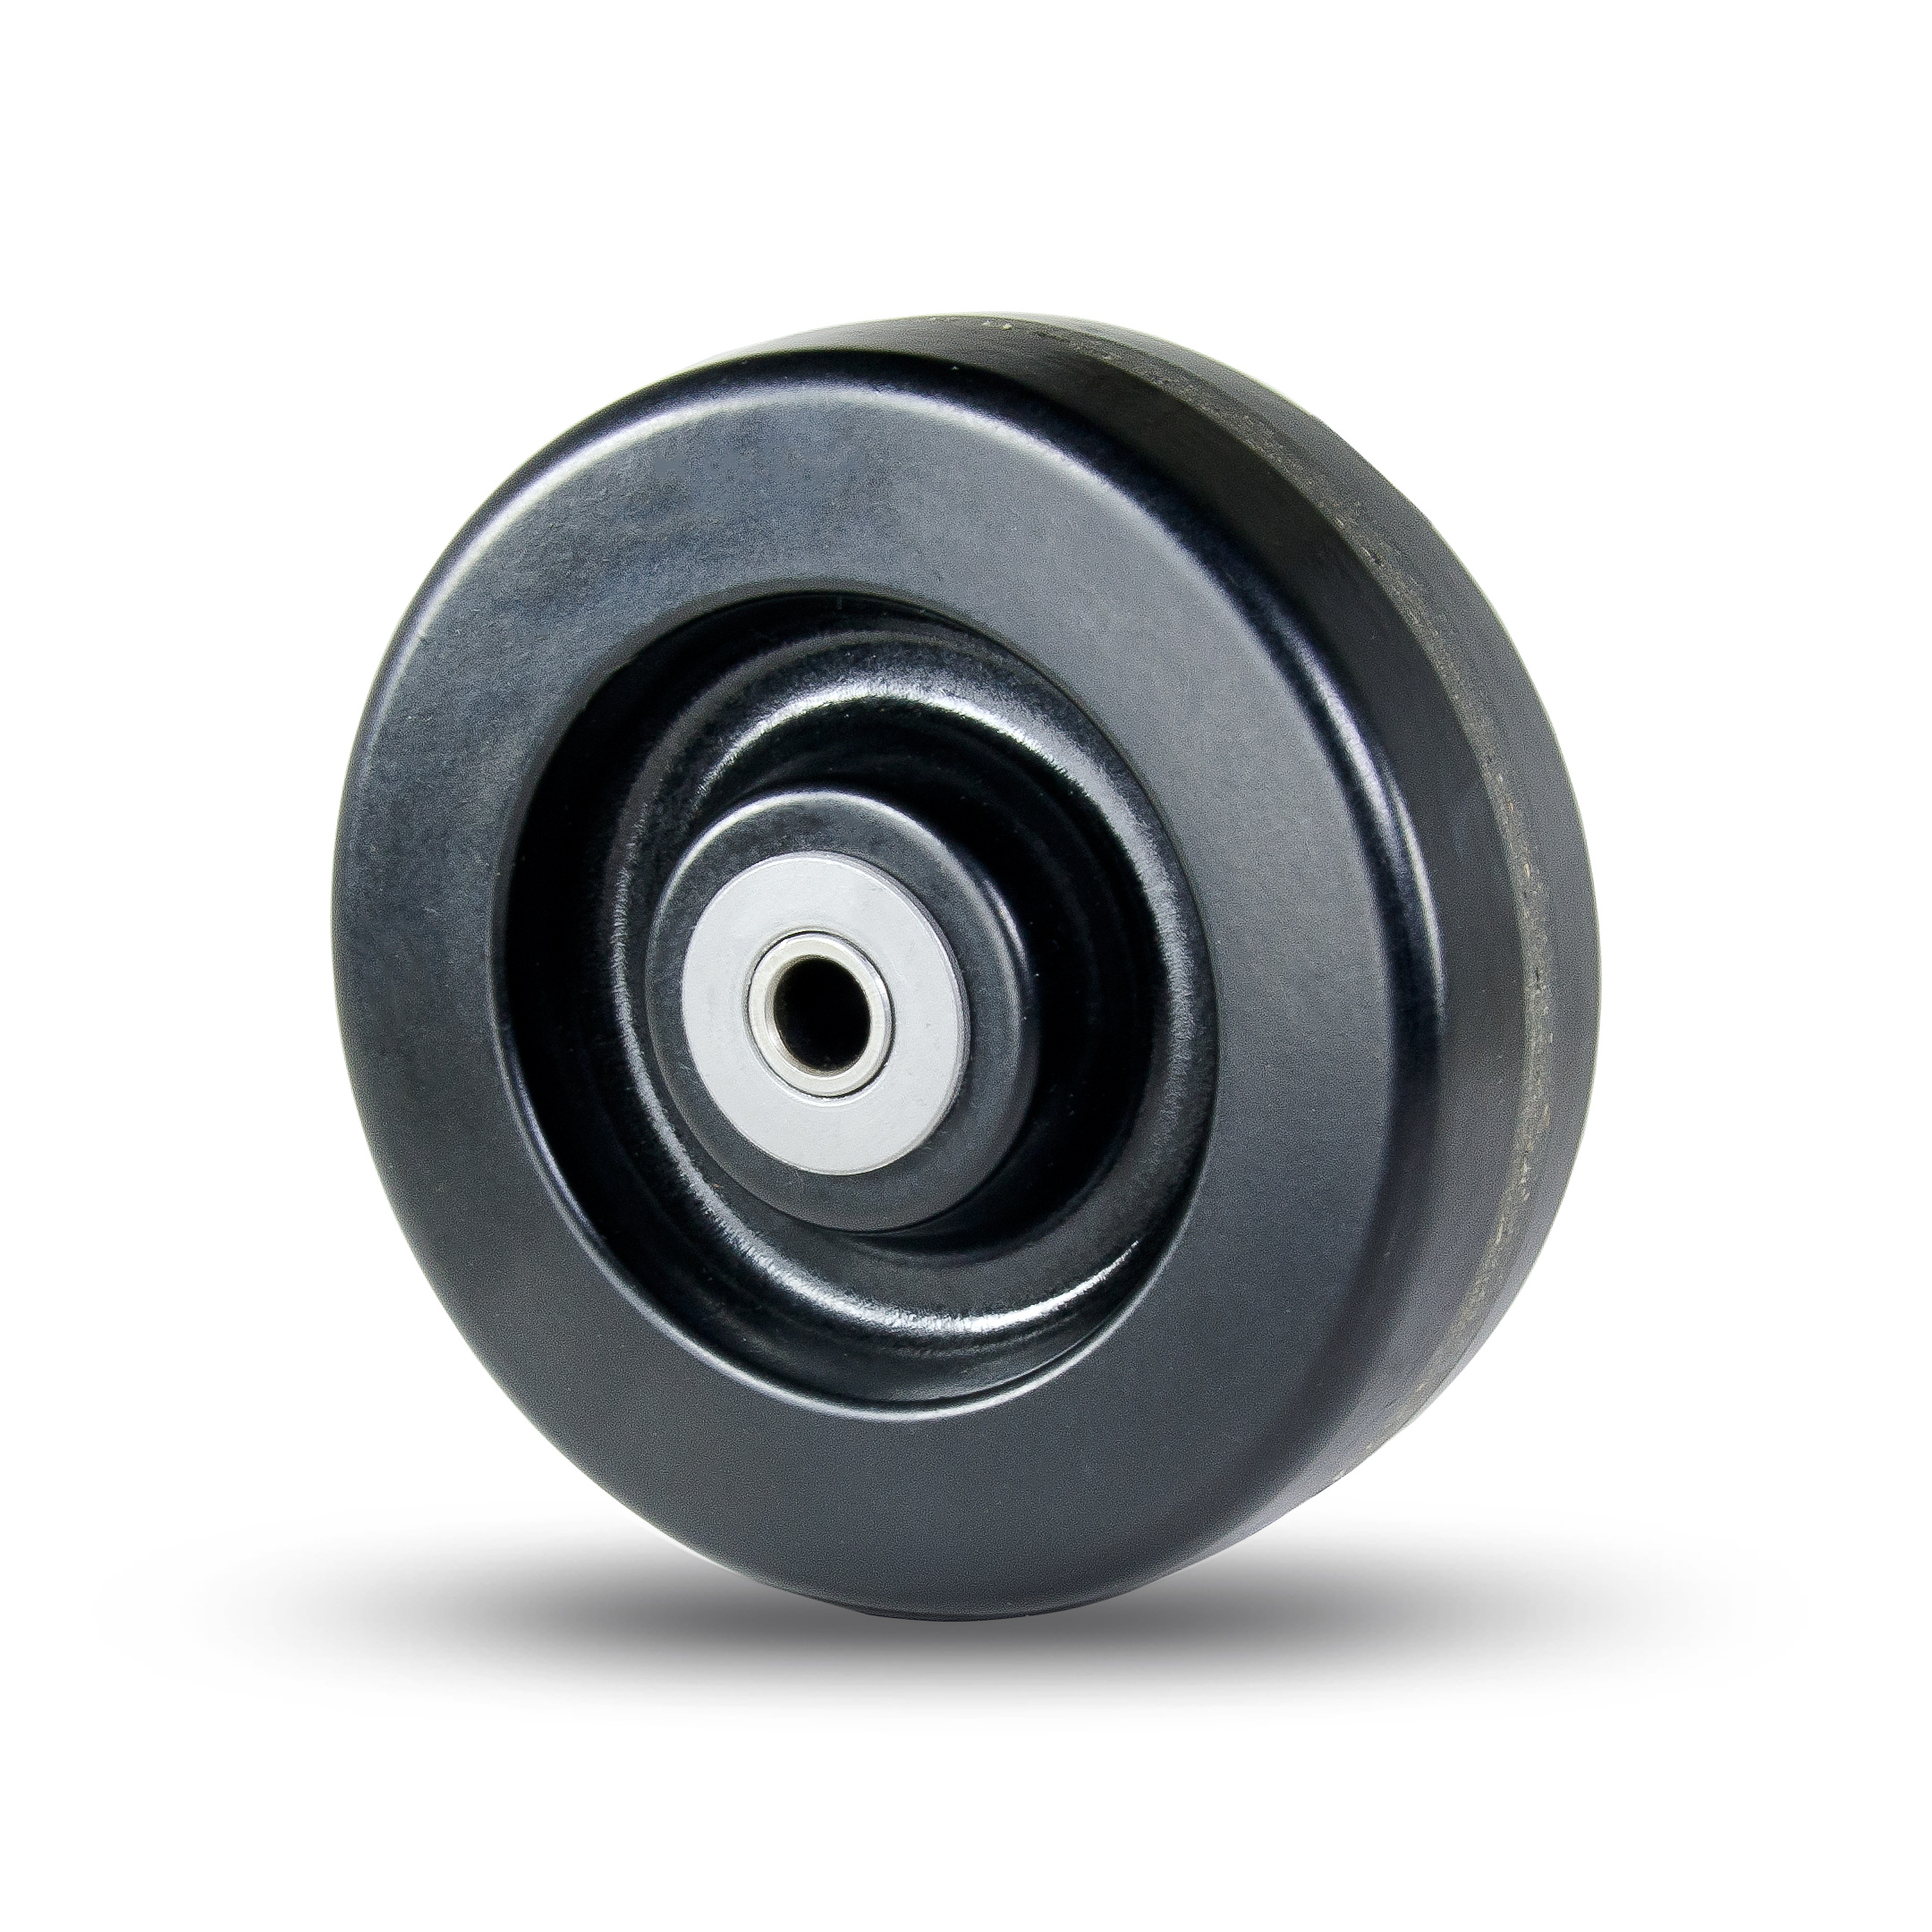 Phenolic caster wheel